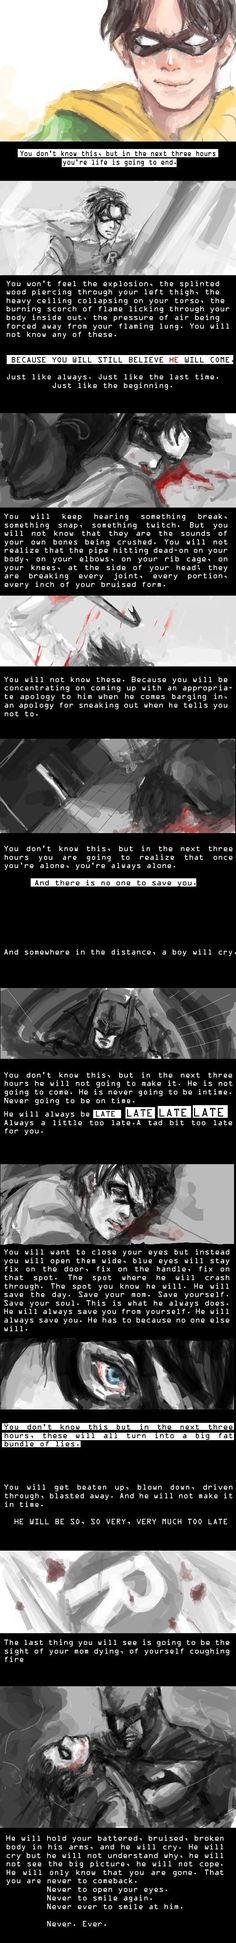 Jason Todd - Exalt 1 of 2 by ~LemonedShake on deviantART. Im cryinggggggg poor jason -,_-, Nightwing, Batgirl, Im Batman, Batman Robin, Jason Batman, Tim Drake, Dc Comics, Robins, Red Hood Jason Todd